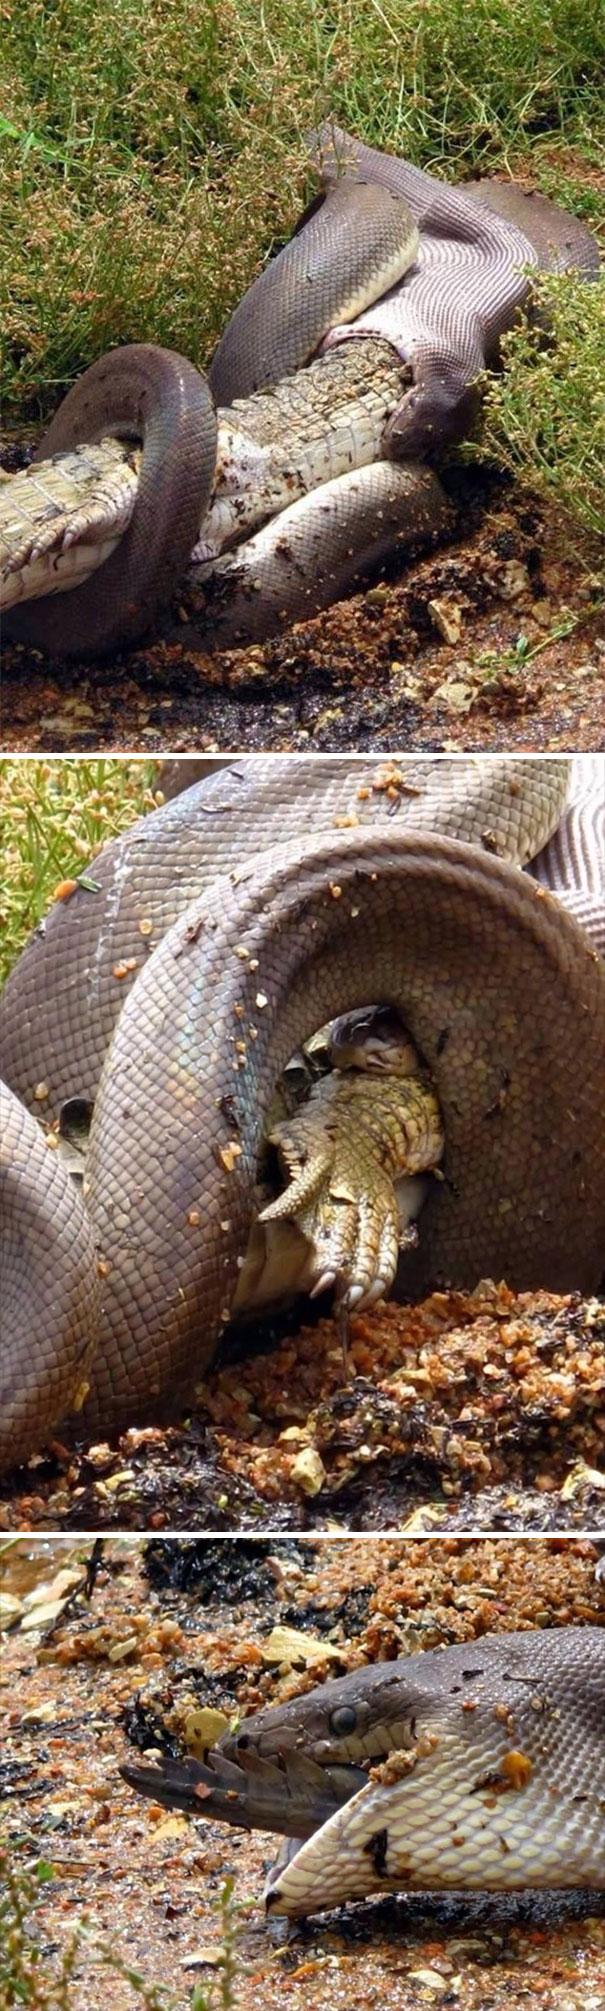 australia-scary-nature-animals-5-5d230233ded3c__605